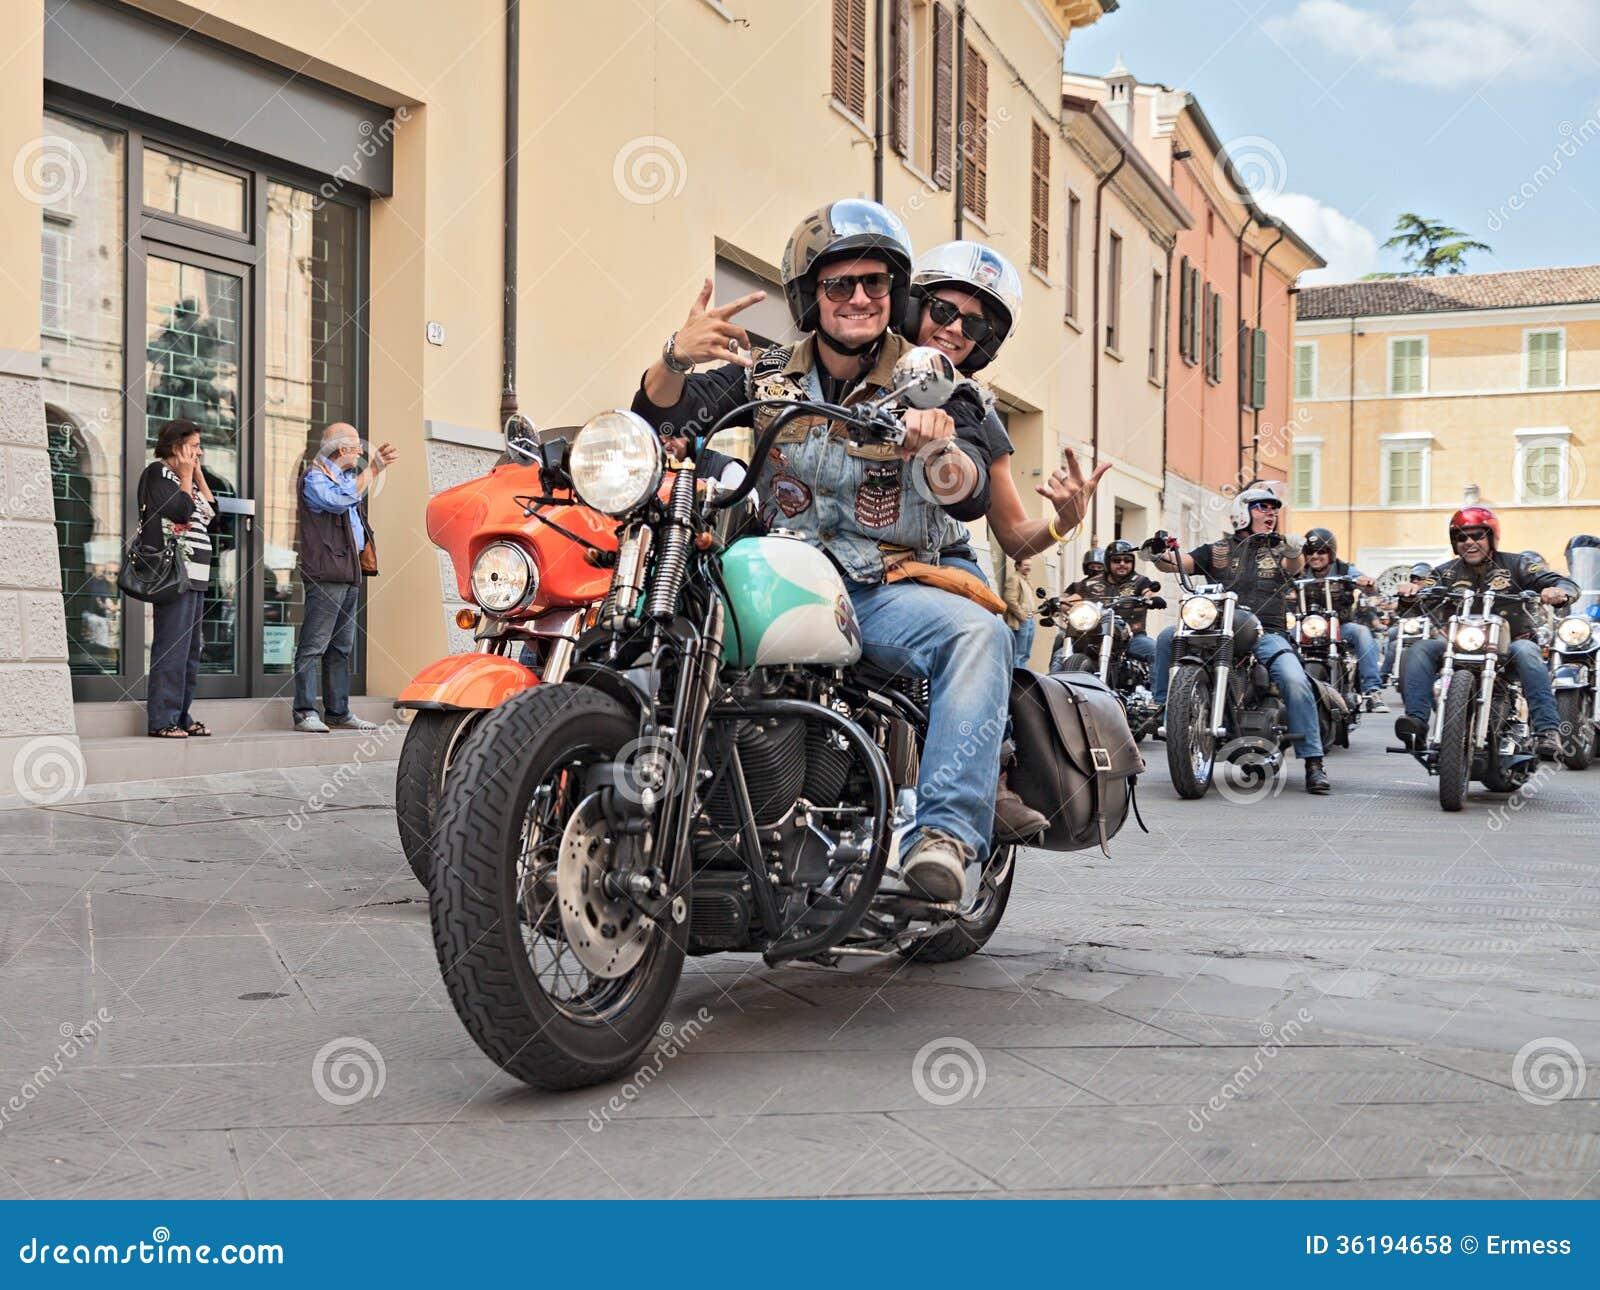 Bikers Waves Riding Harley Davidson Editorial Stock Photo Image Of